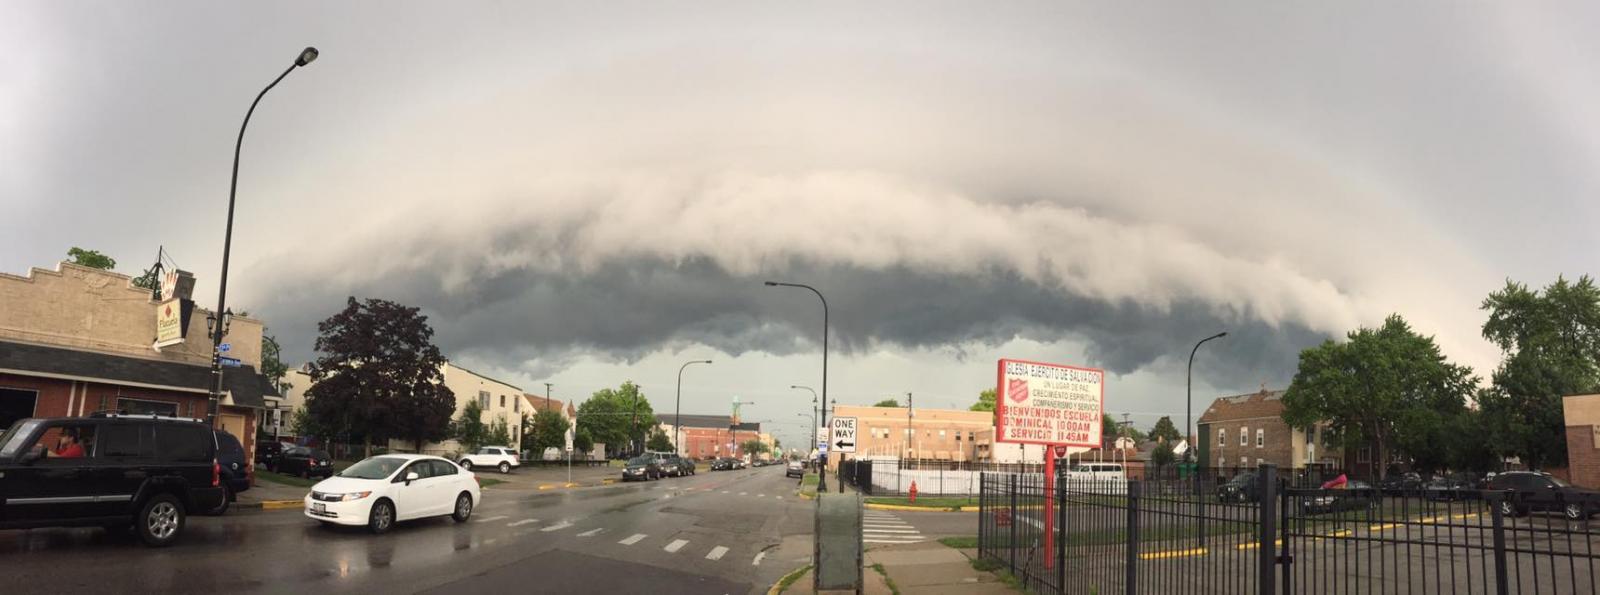 Shelf Cloud by Kevin Sheely, Cicero, IL